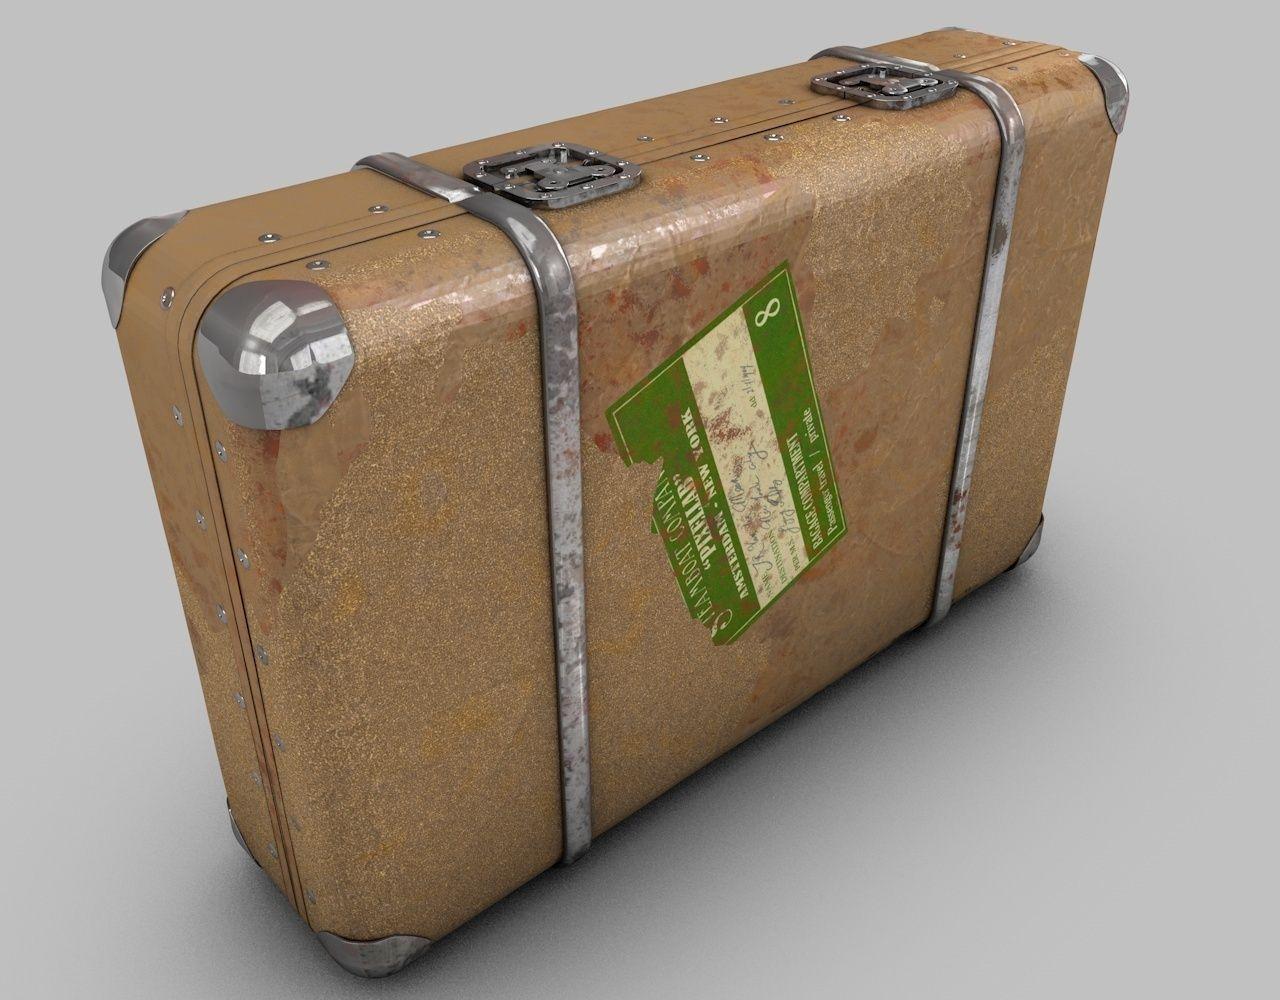 Vintage old suitcase 3d model obj 3ds fbx c4d dxf for The vintage suitcase